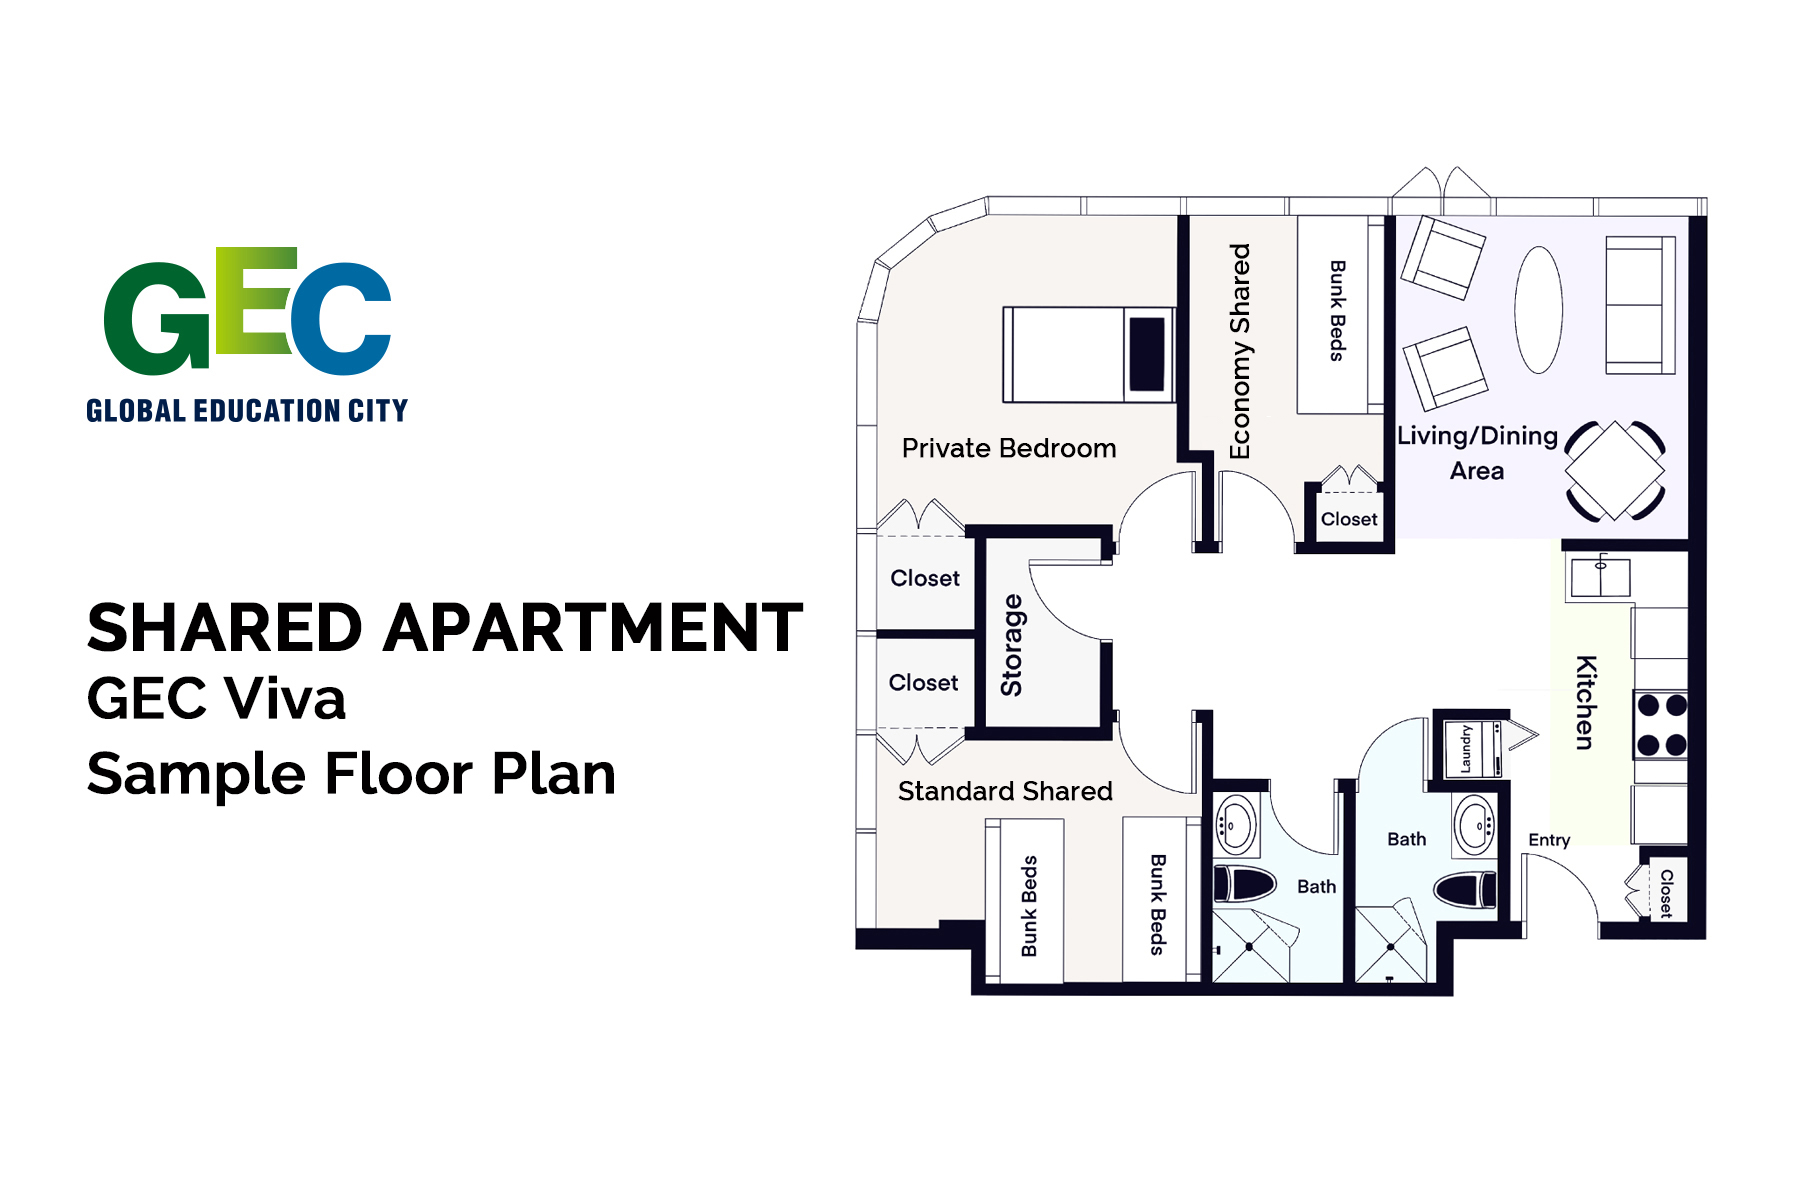 Economy Shared Bedroom floor plan